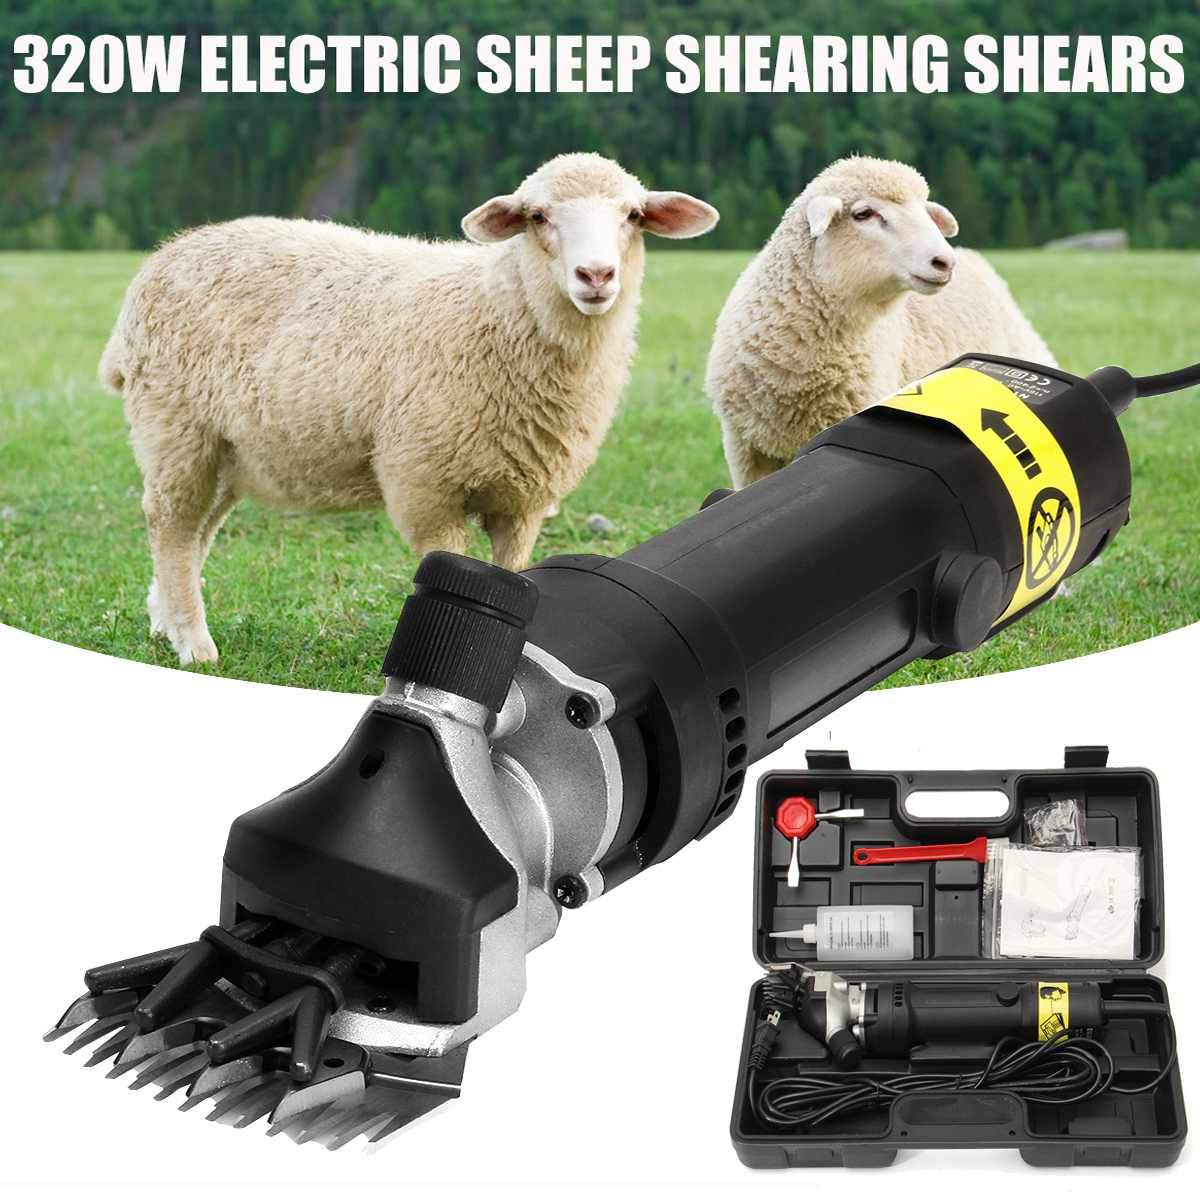 320W Electric Sheep Shears Clipper Goat Wool Cut Shearing Trimmer Farm Suppliers